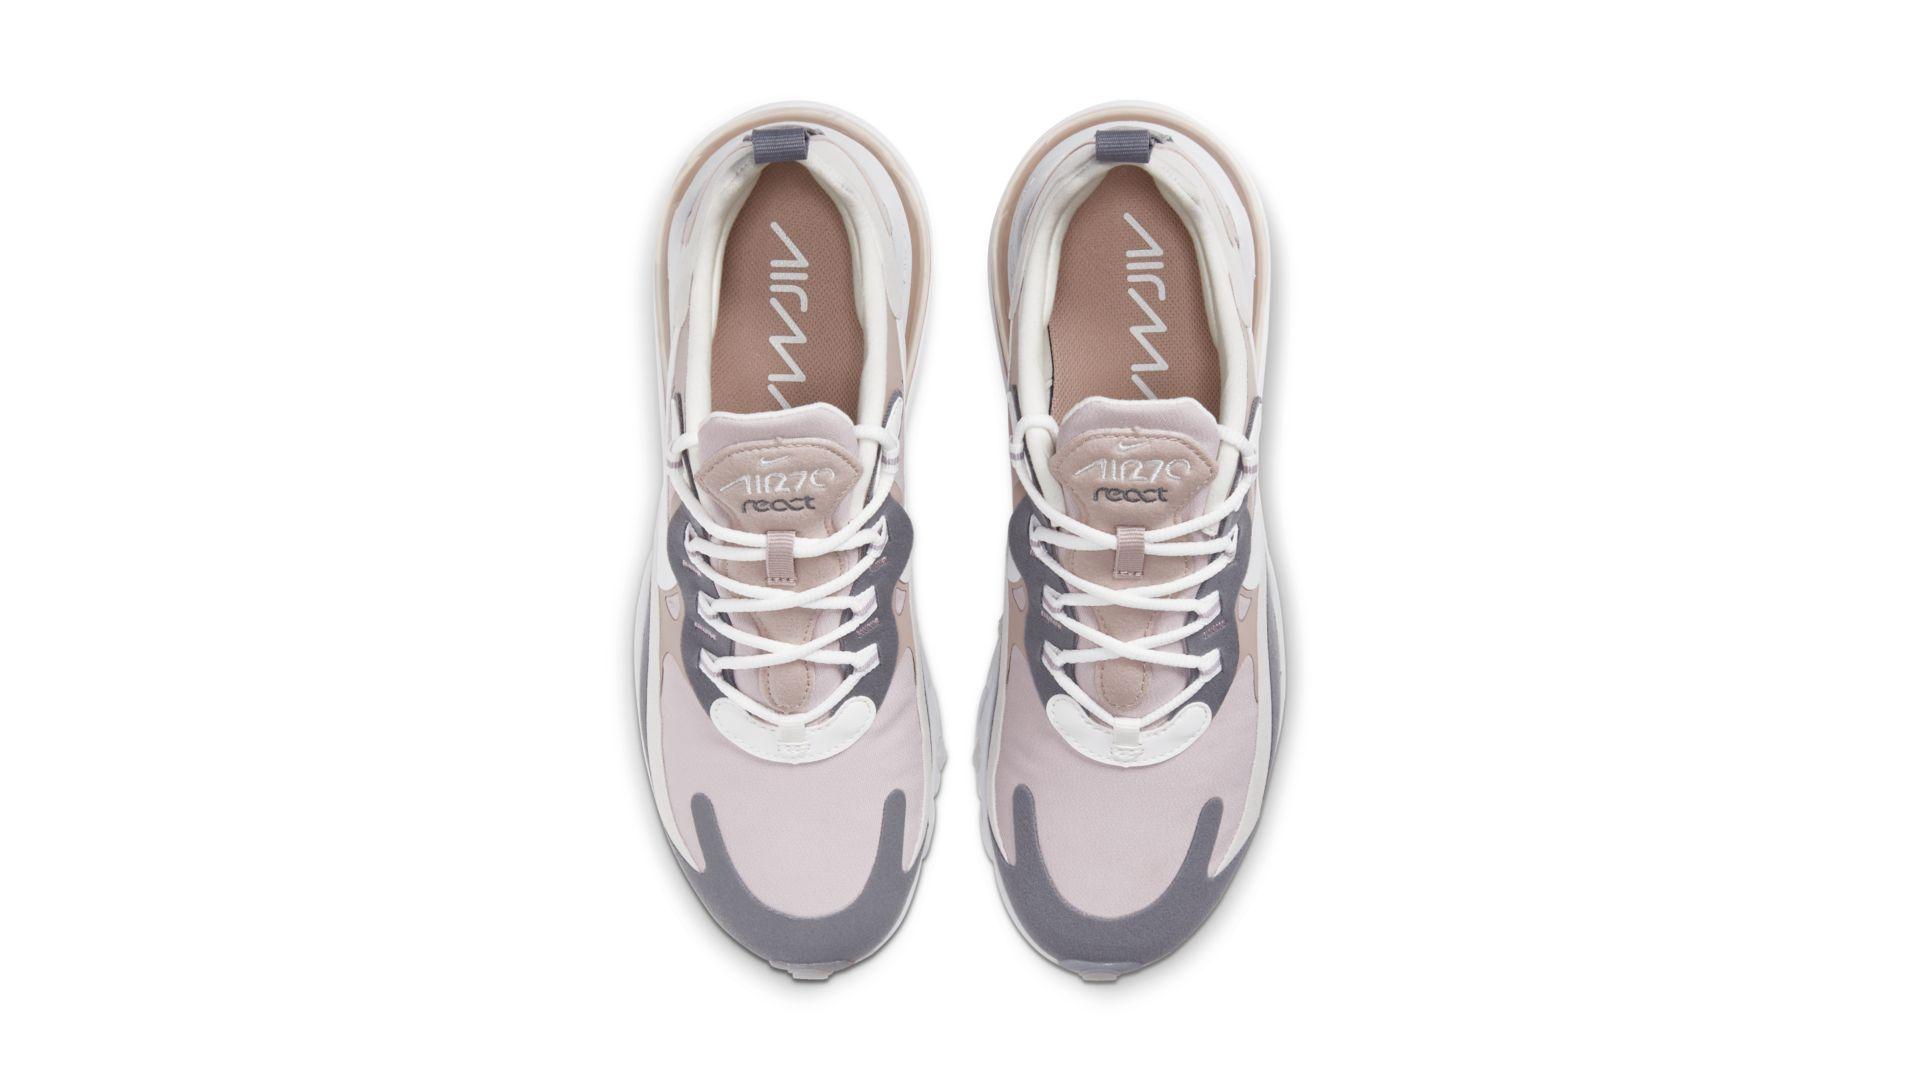 Nike Air Max 270 React Plum ChalkSummit Sneaker